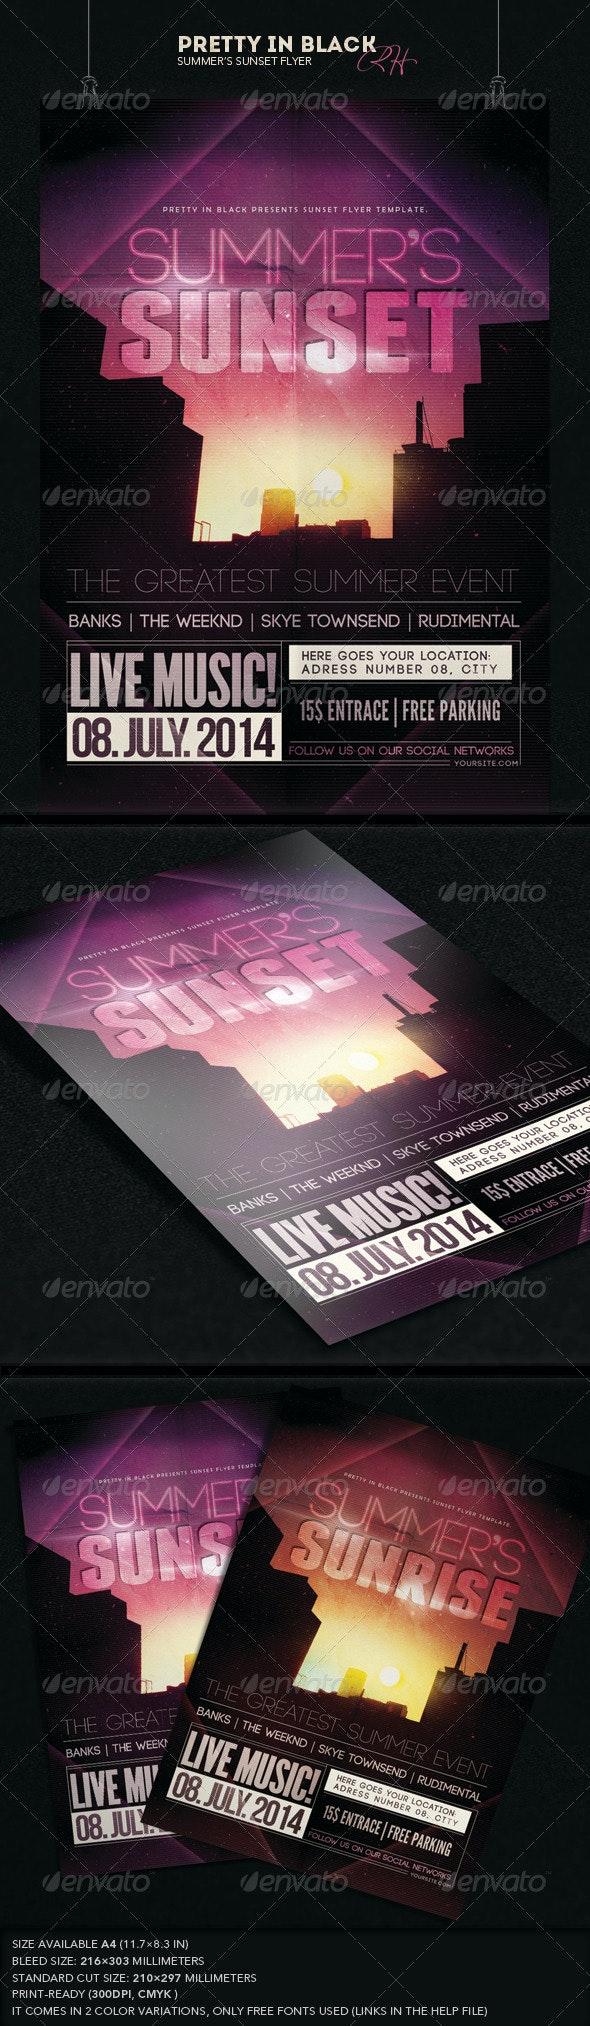 Summer's Sunset Flyer - Flyers Print Templates